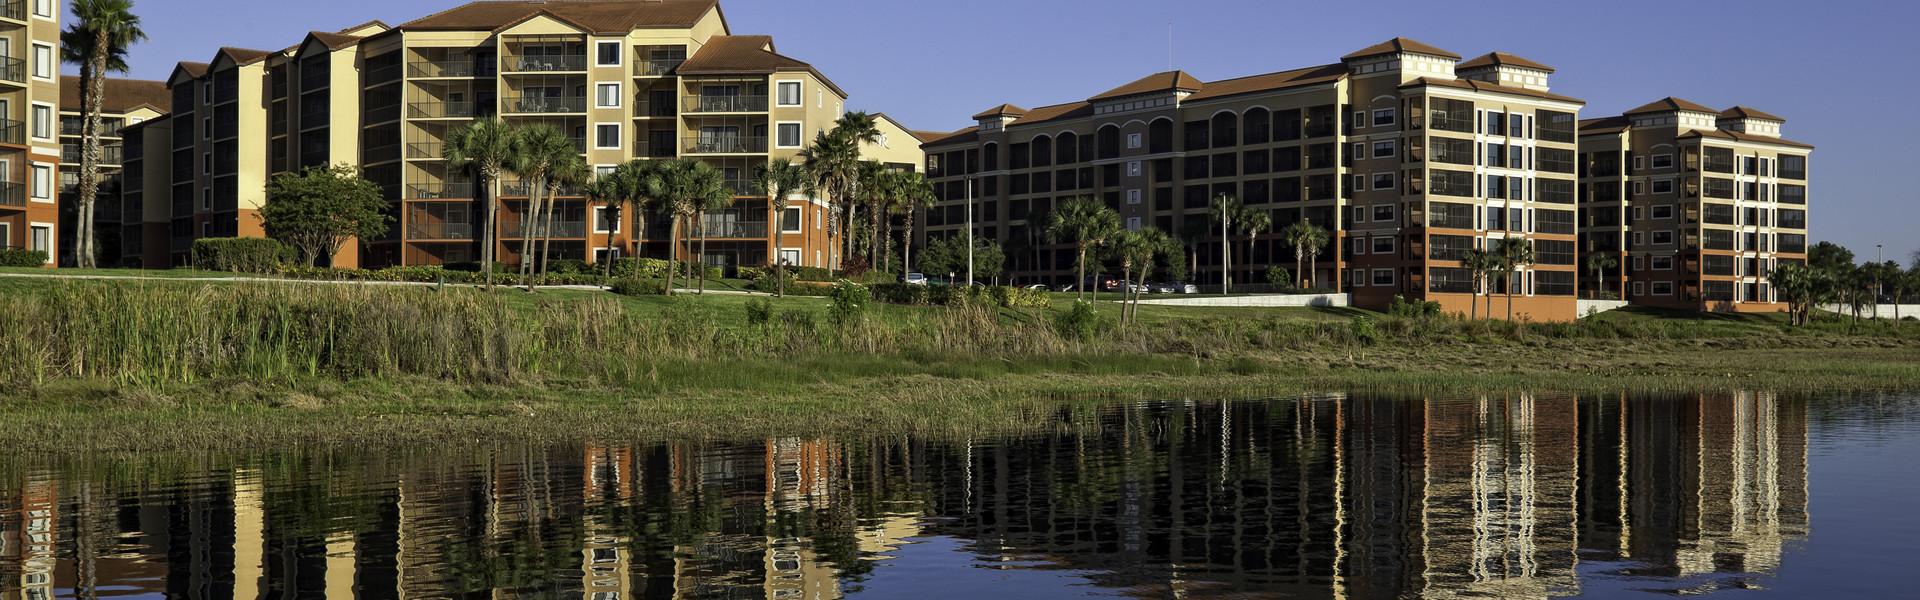 Luxury Rooms & Suites Near Disney in Orlando Florida | Westgate Lakes Resort & Spa